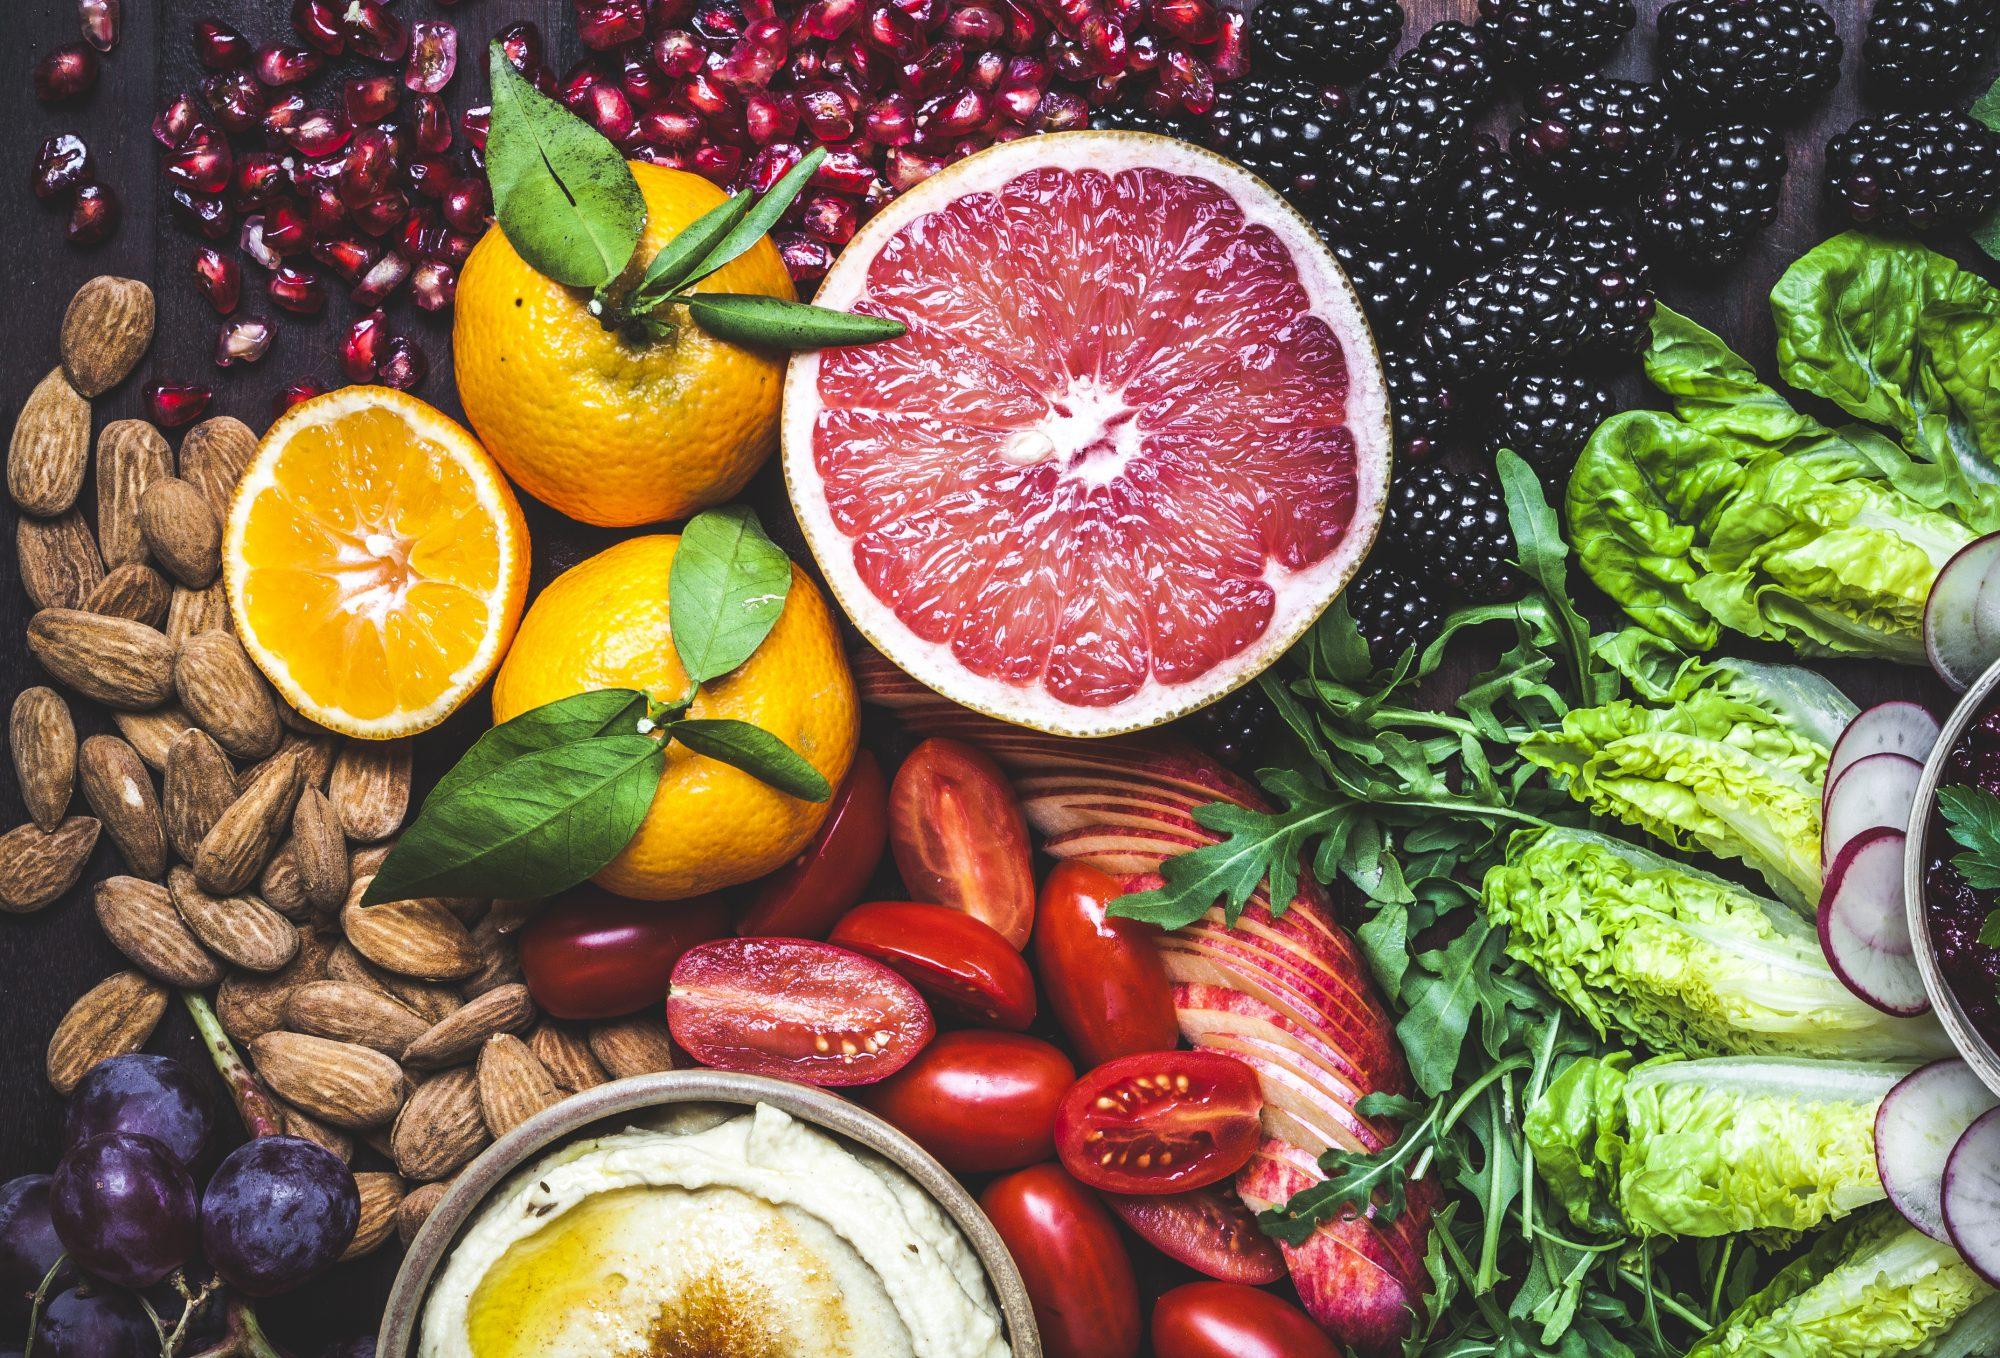 Image of produce